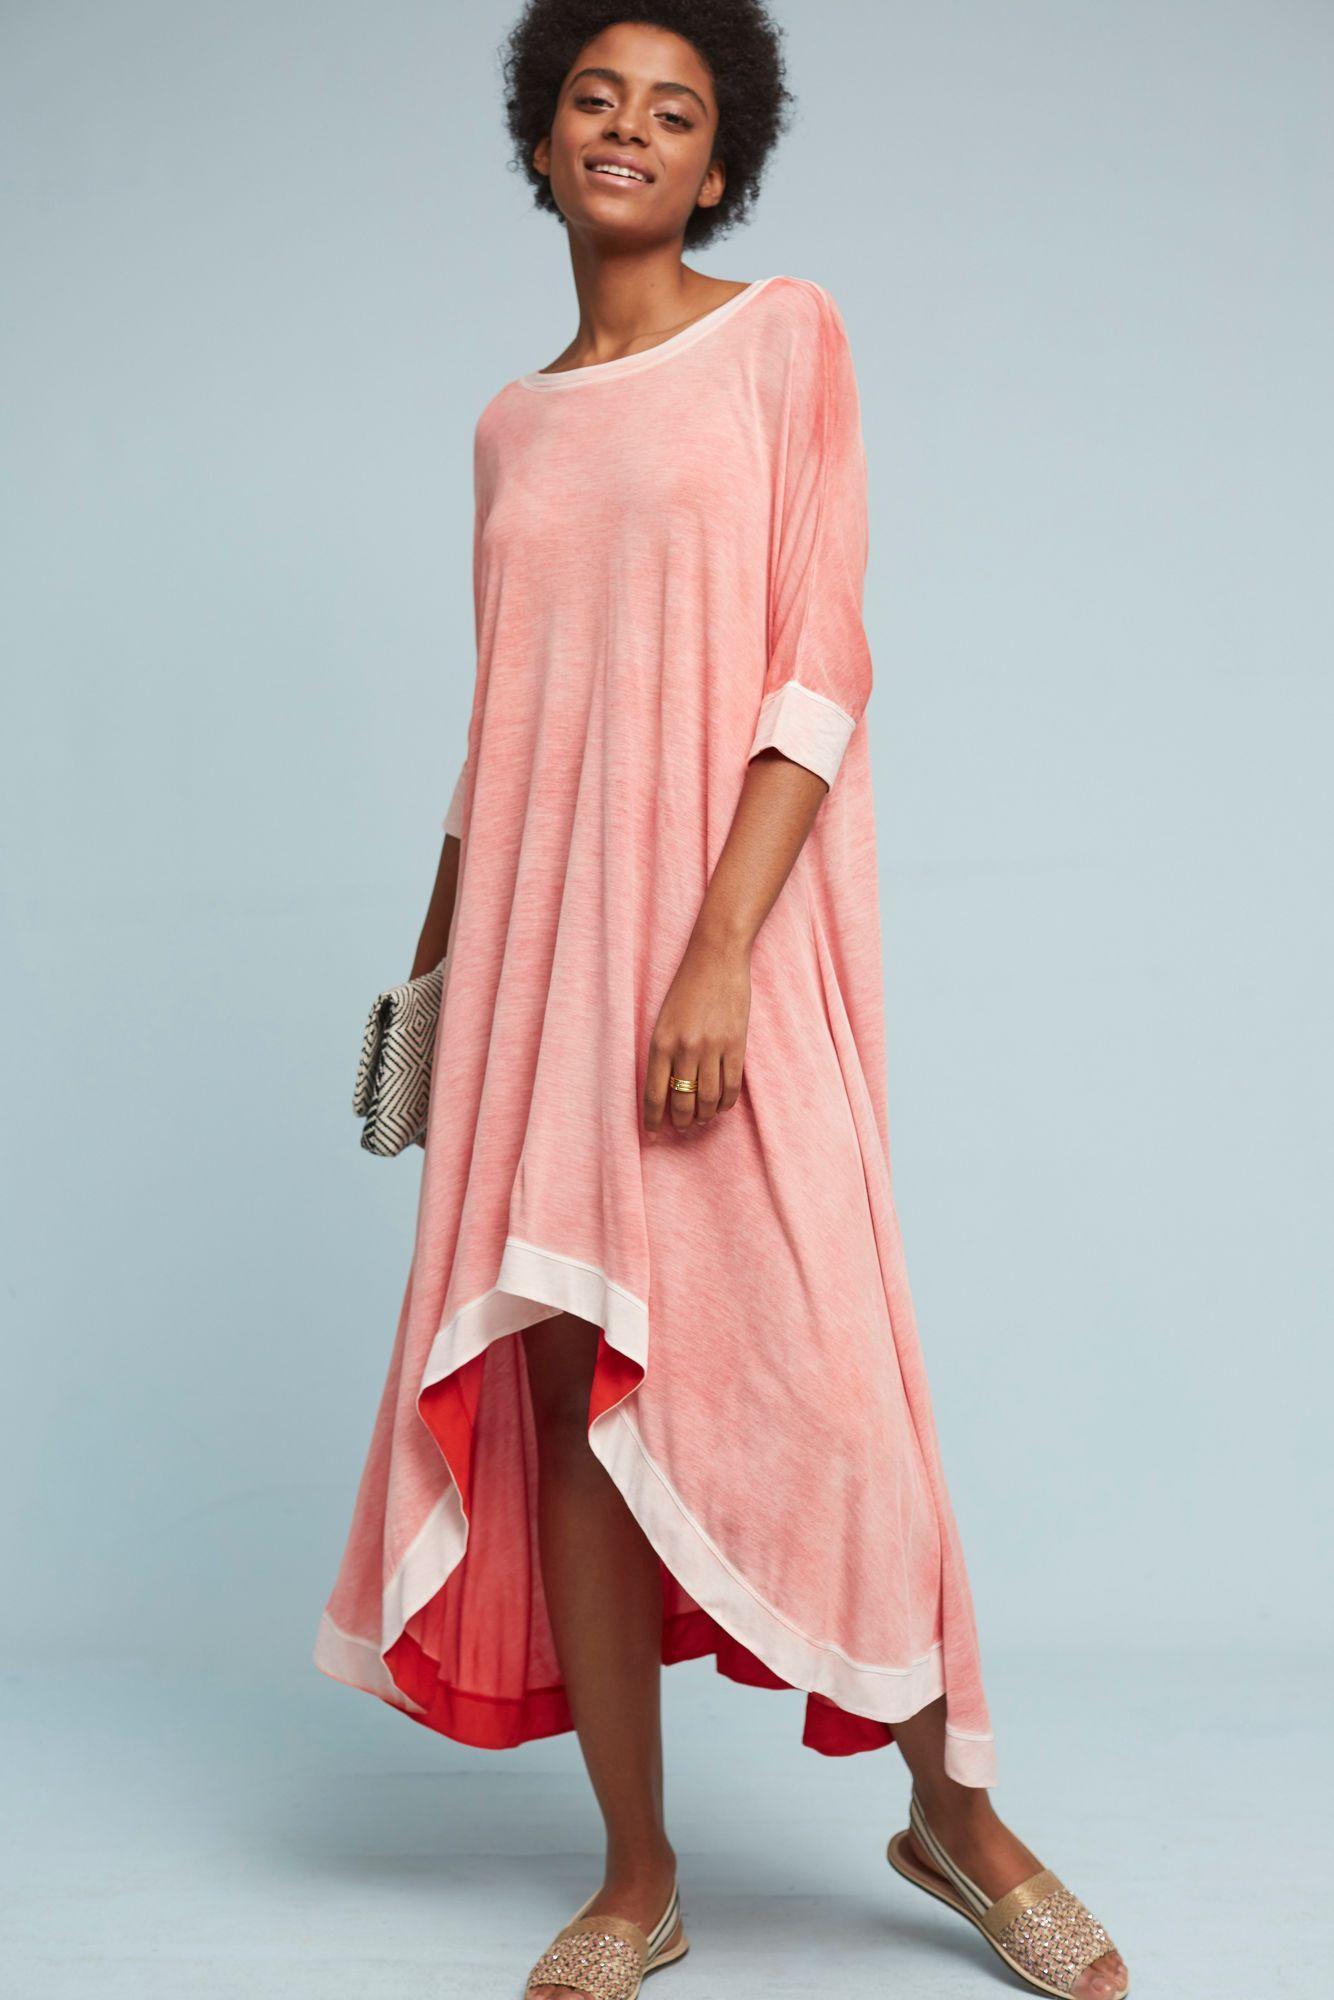 Lyst - Lilka Feteworthy Knit Dress in Red